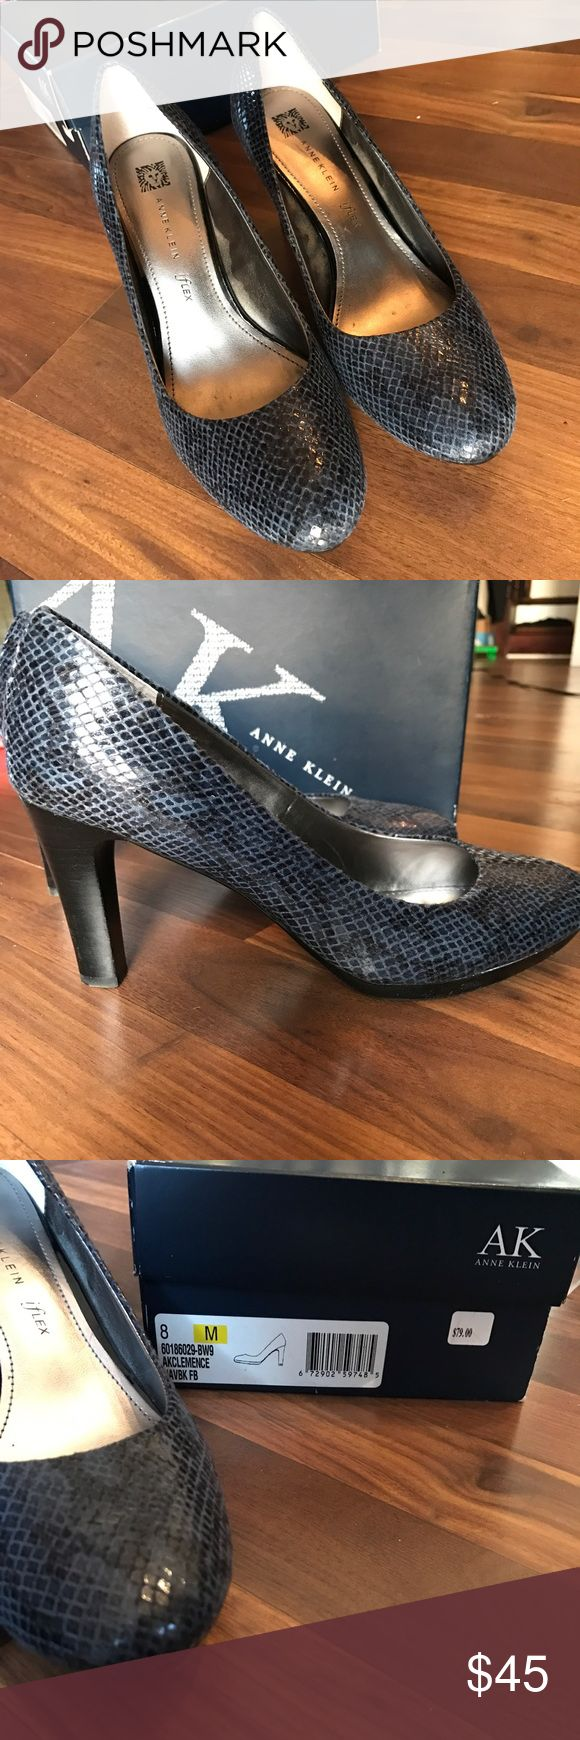 Navy and Black Snake Print Thick High Heel Shoes Navy and Black Snake Print Thick High Heel Shoes. iFlex. Gently worn. Anne Klein Shoes Heels